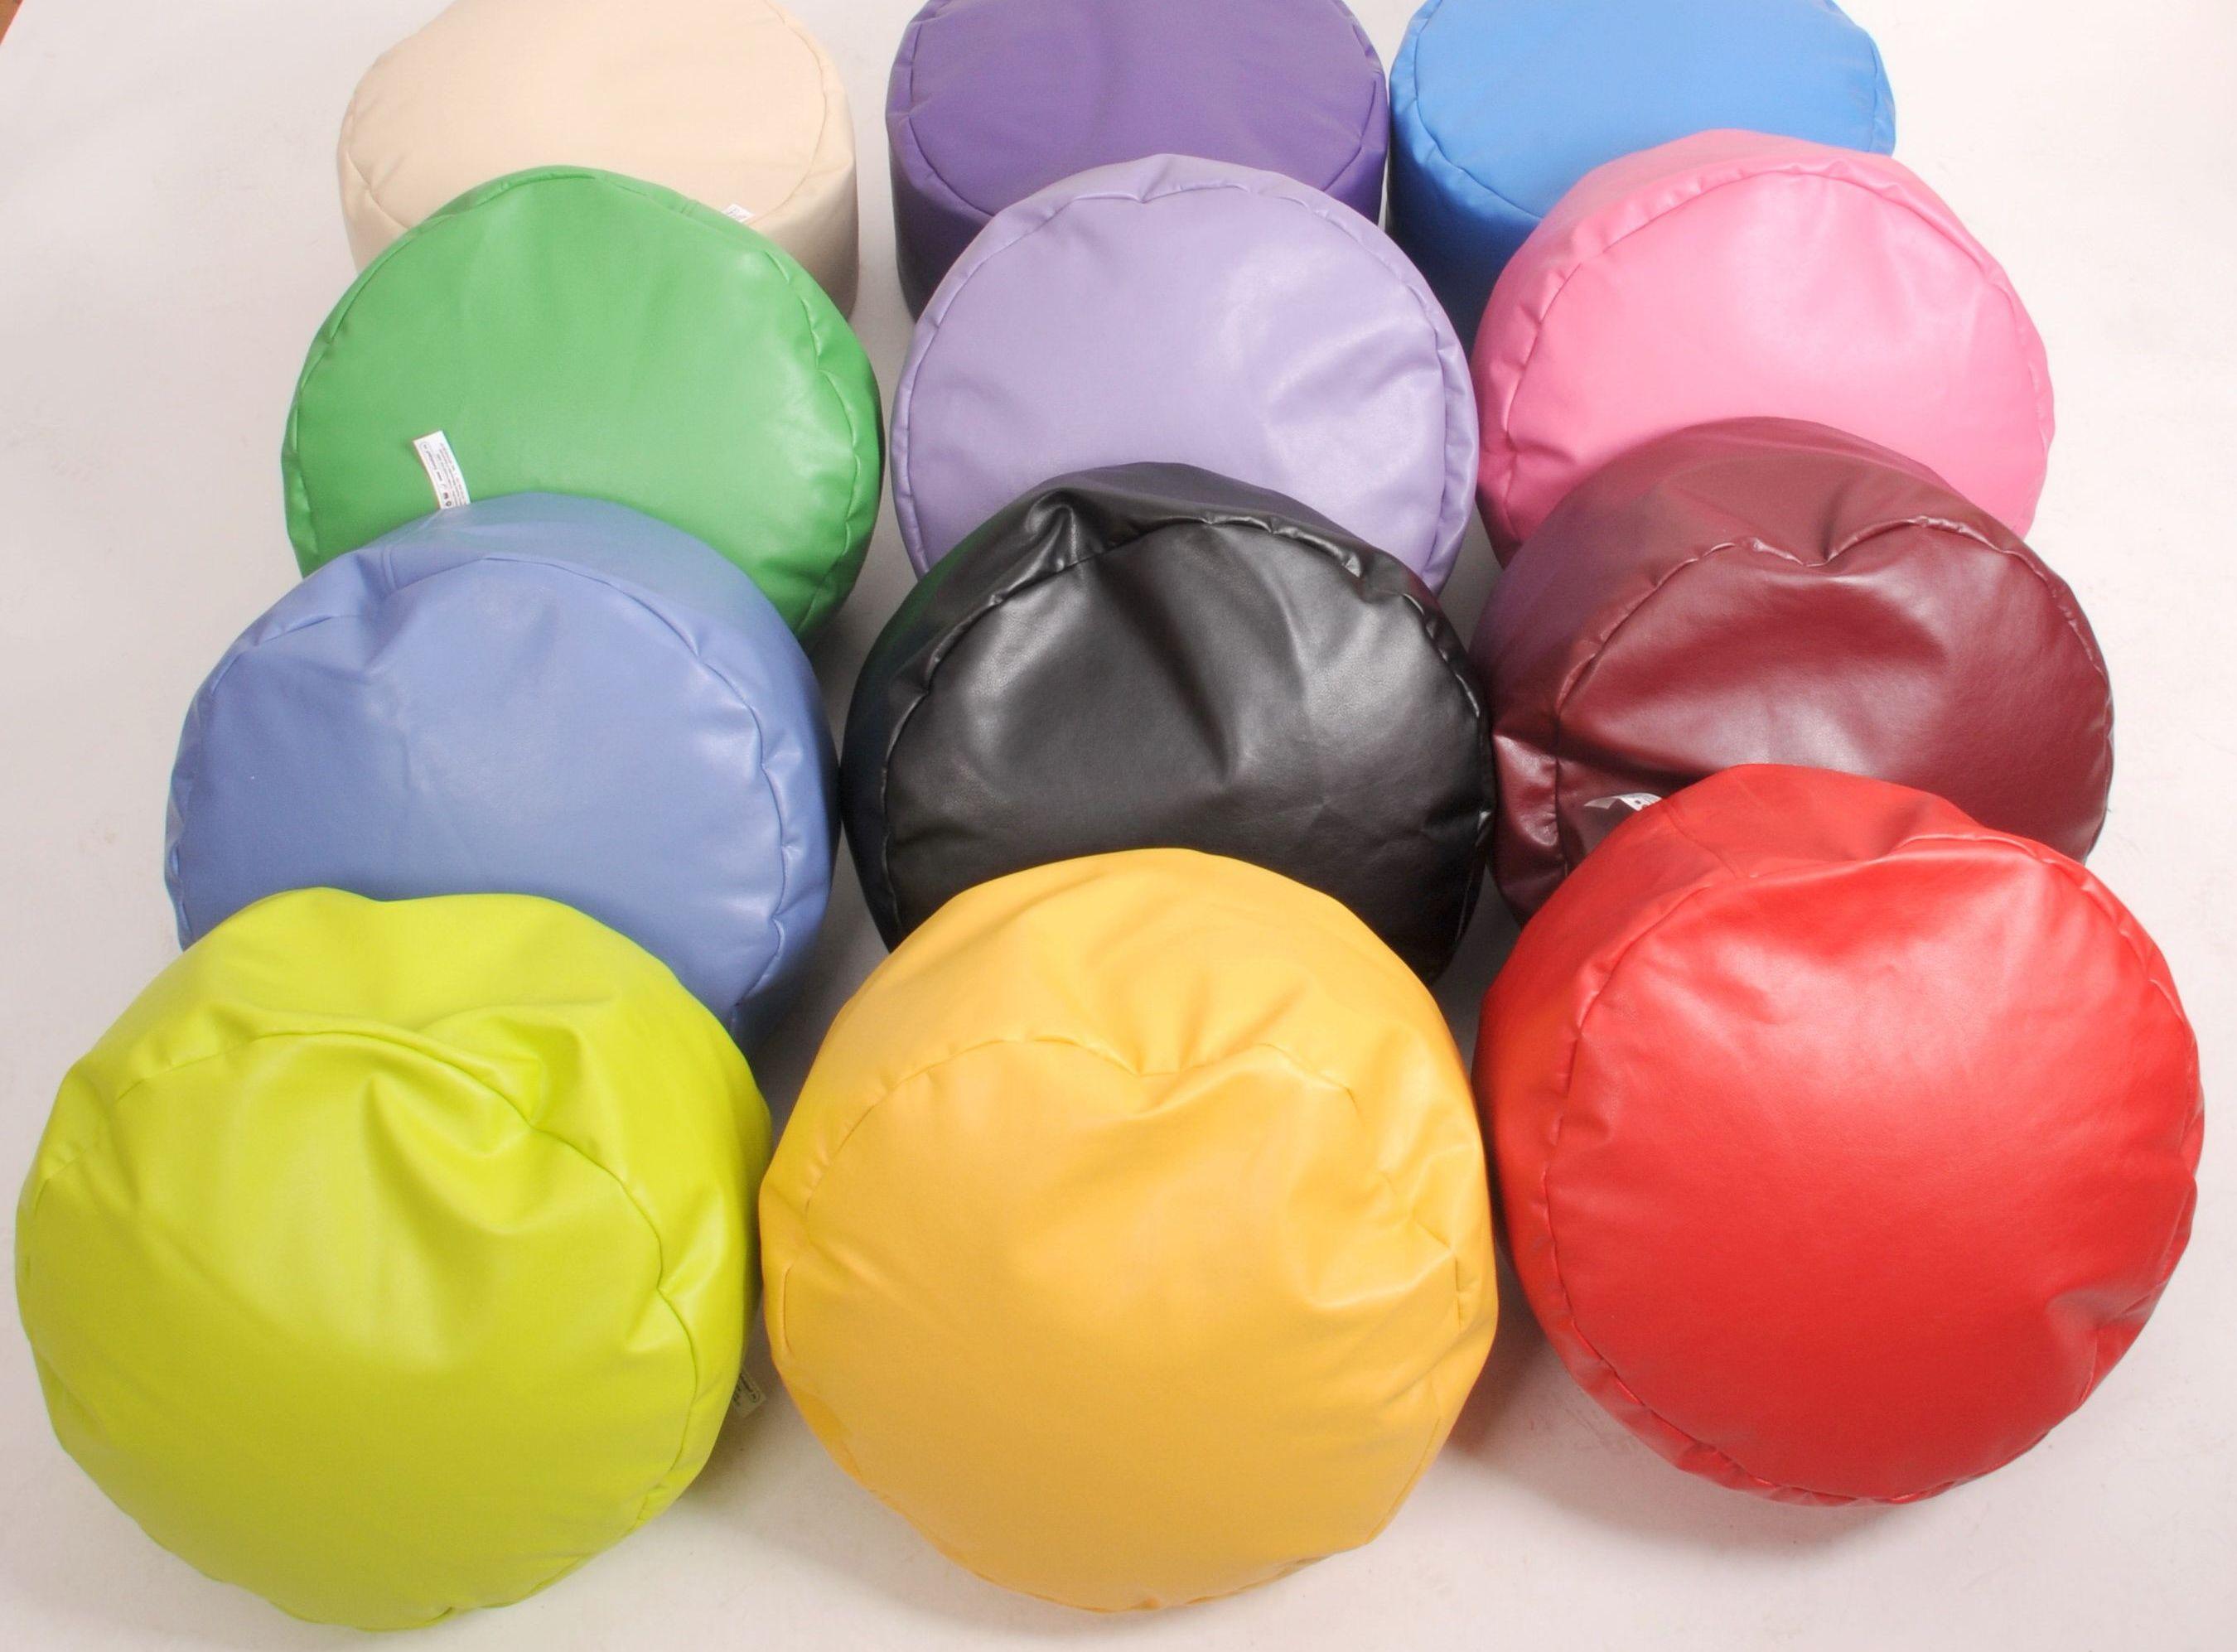 Fotolii beanbag drum stool.  Diametru 55 cm, h 25 cm, pret 64,5 lei (15 euro)